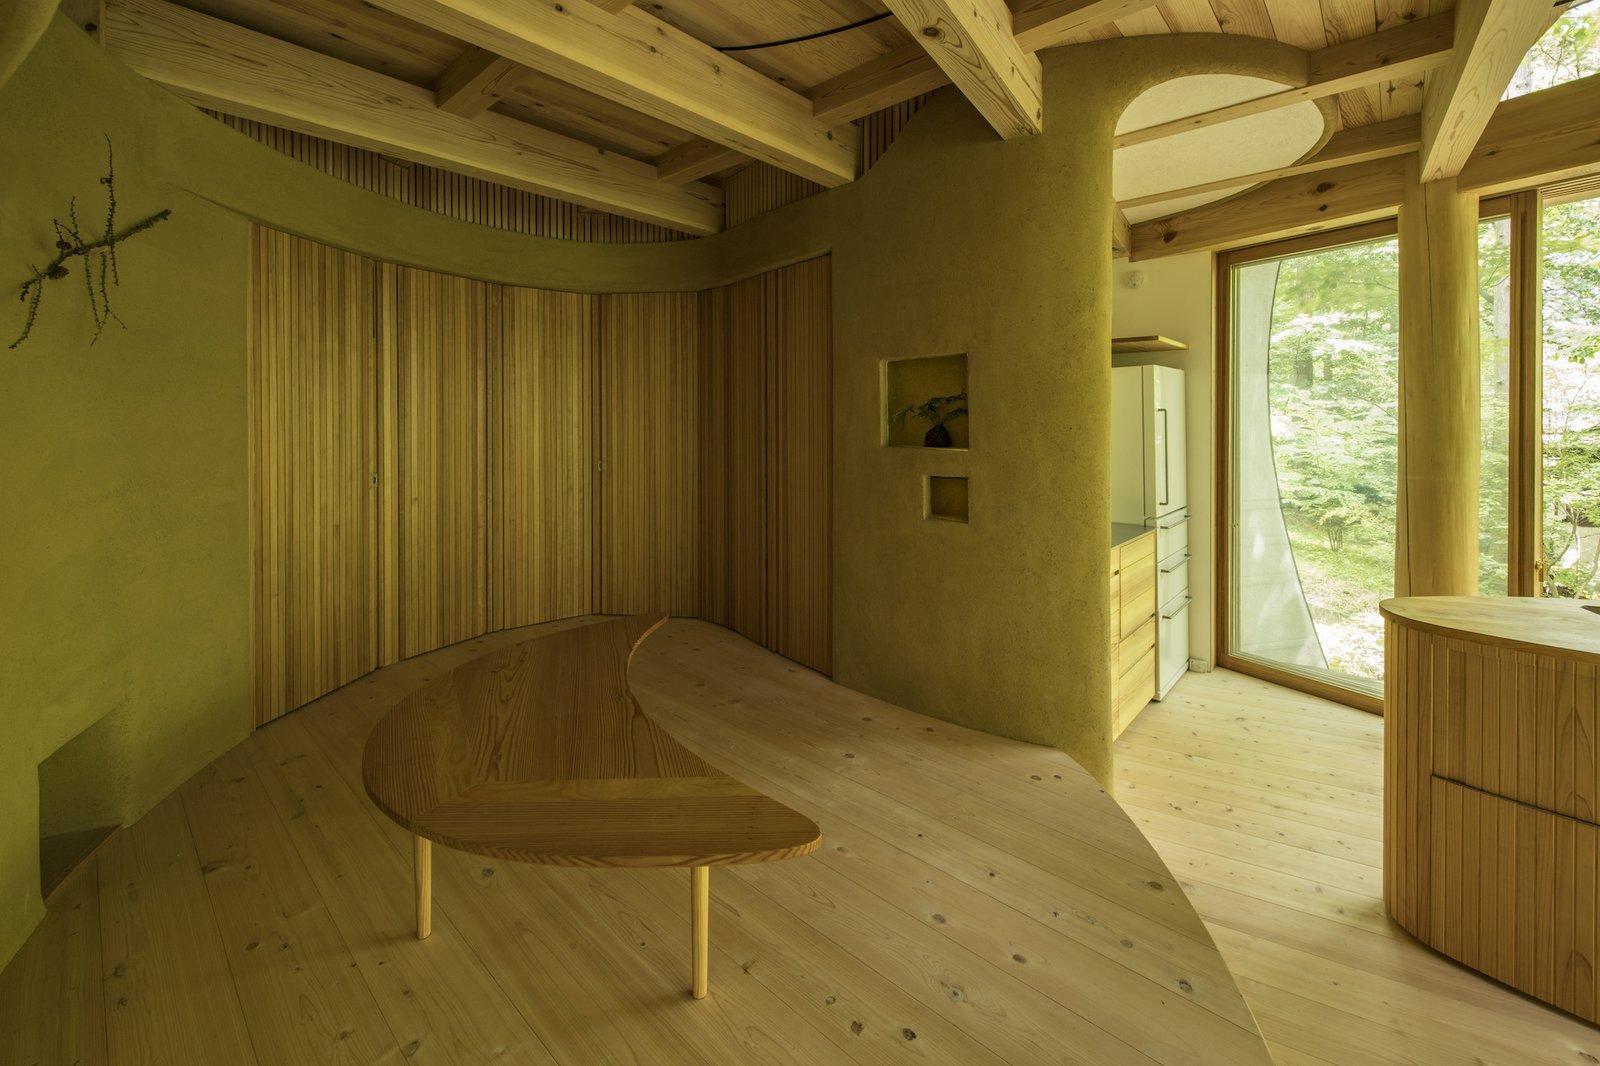 Dining area of Shell House by Tono Mirai Architects.